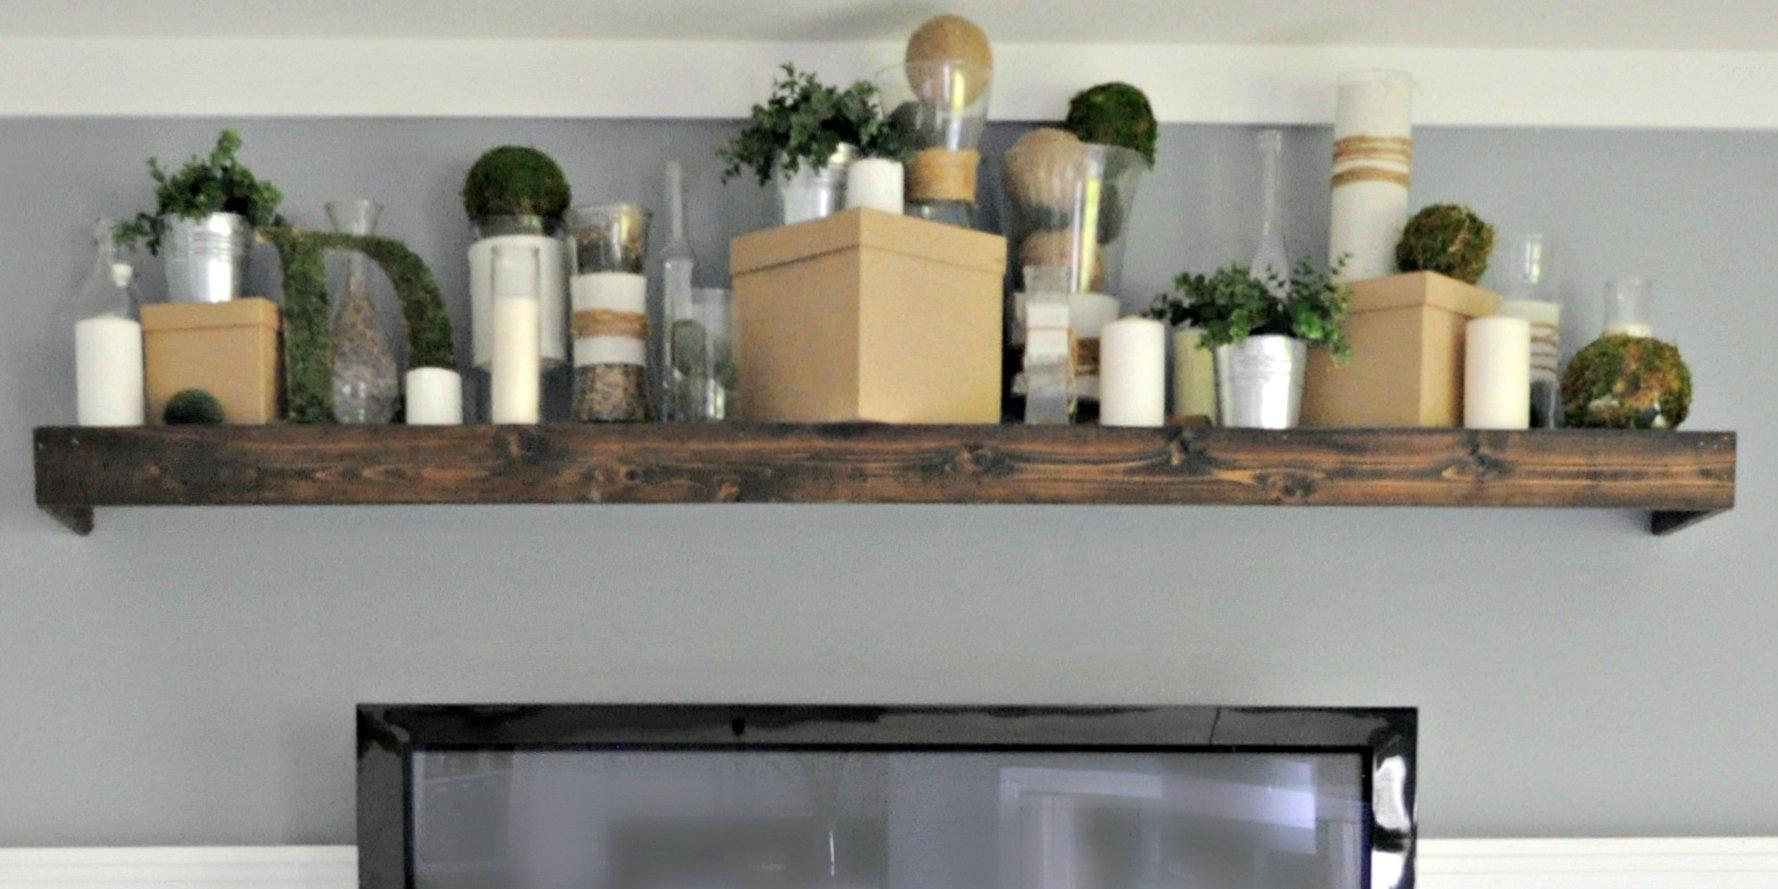 ikea floating shelves instructions